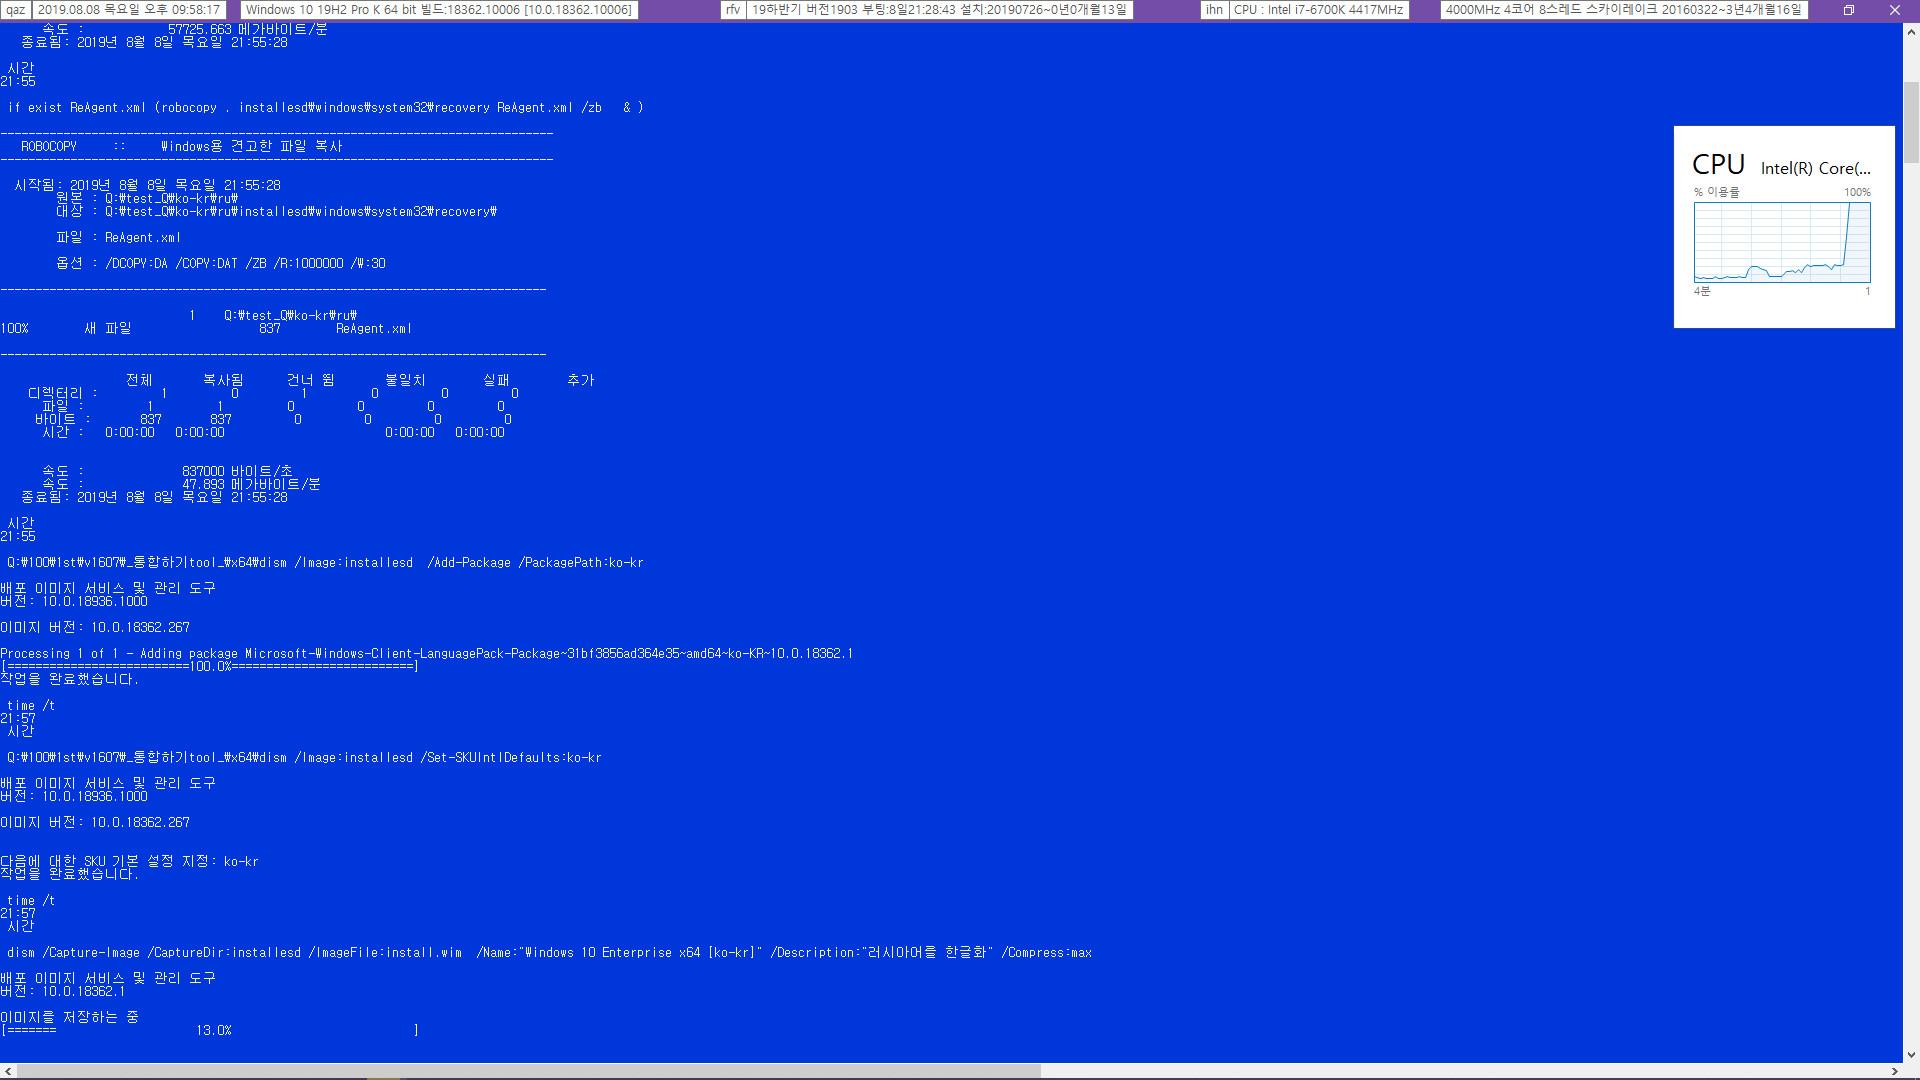 Windows 10 Enterprise x64 lite 1903 build 18362.267 by Zosma.iso - 러시아어 한글화 시도 - iso 뼈대만 한글판 iso로 교체하니까 설치 거부되네요-그래서 install.esd 윈도까지 한글화 시도 2019-08-08_215817.jpg